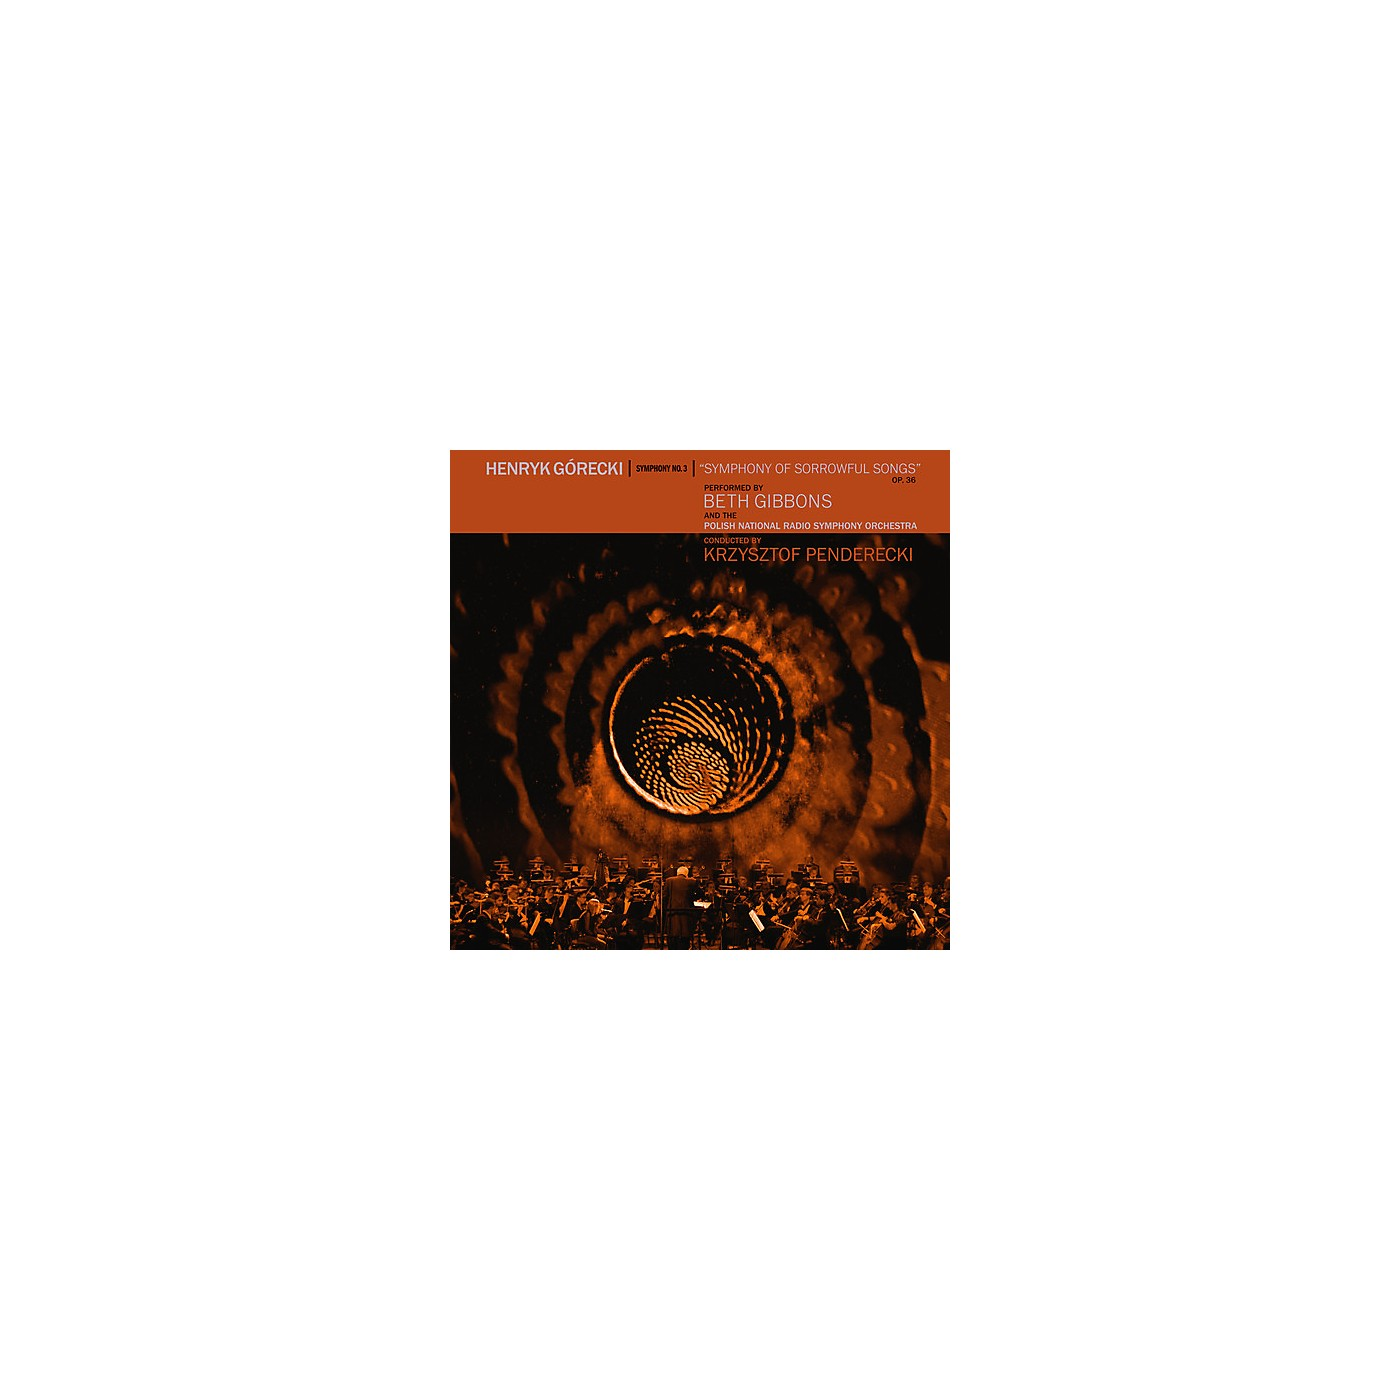 Alliance Beth Gibbons - Henryk Gorecki: Symphony No. 3 (Symphony Of Sorrowful Songs) thumbnail